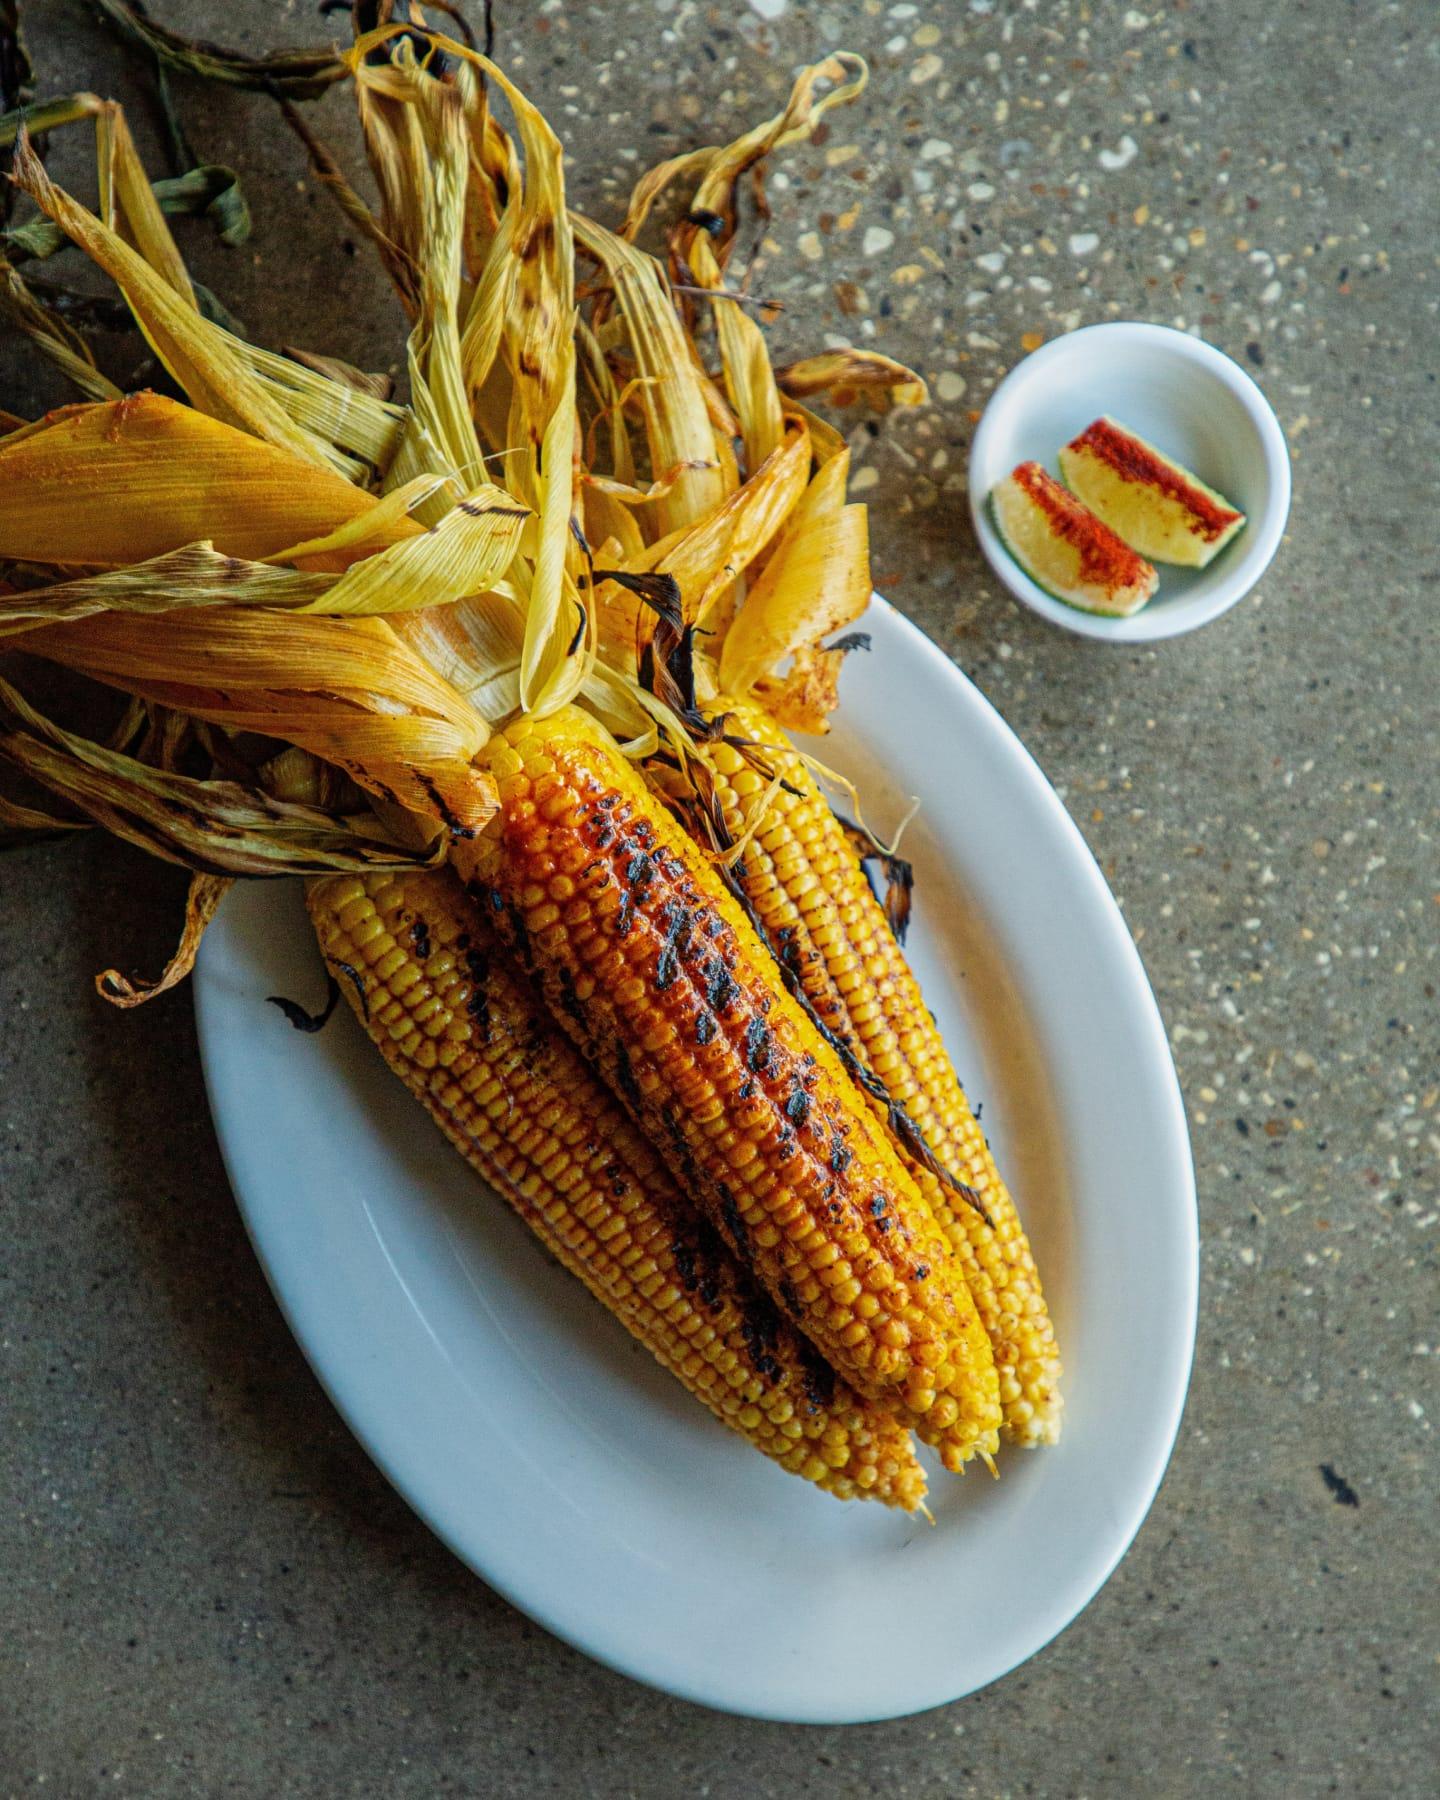 Compère Lapin's Jerk Buttered Corn